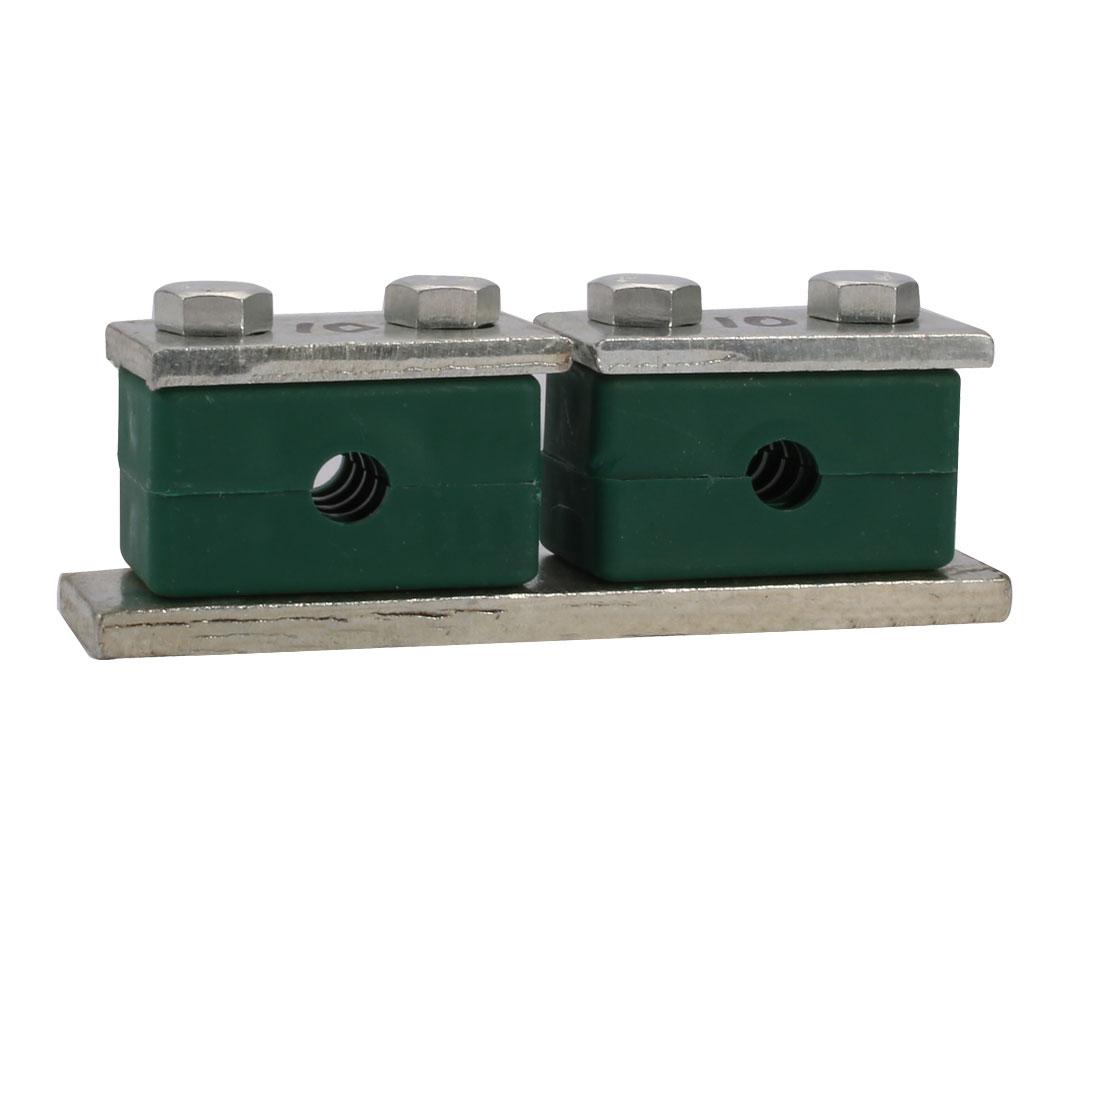 Twin Series Beta Heavy Hose Pipe Clamp Polypropylene Fit 10mm Tube Diameter